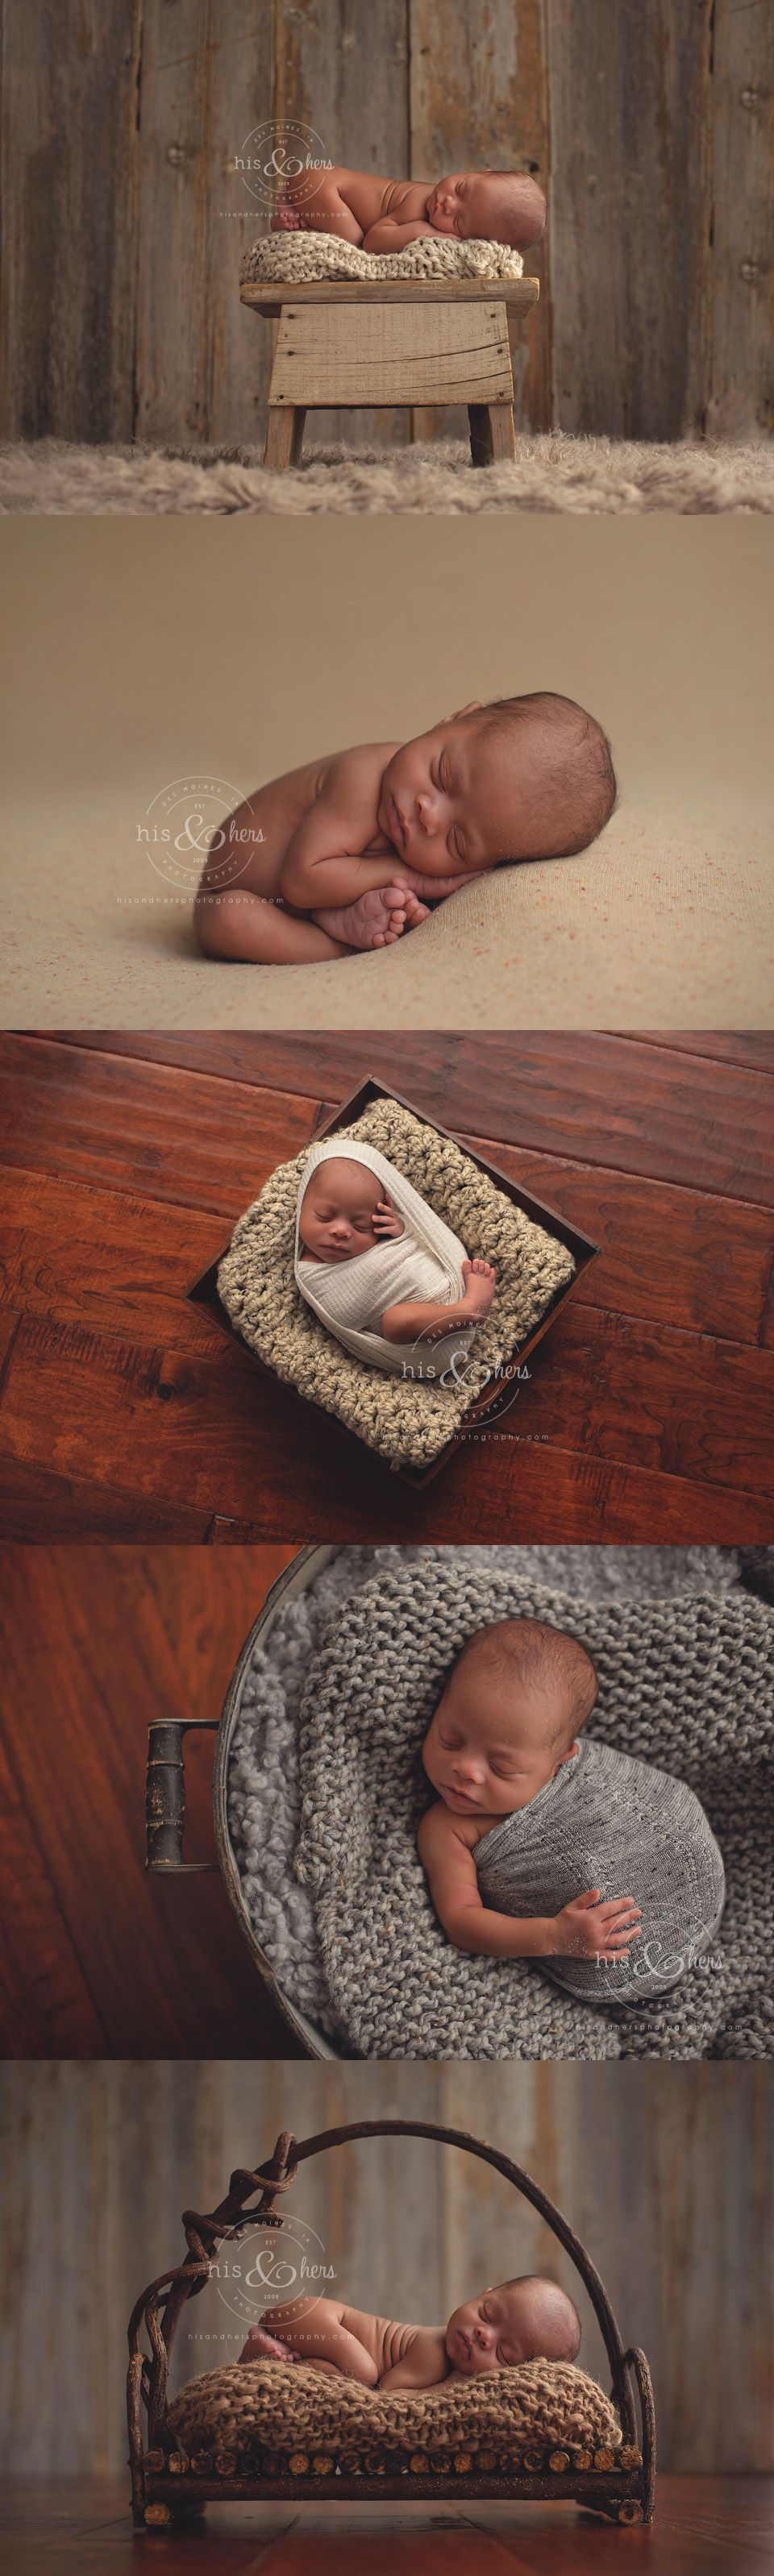 Newborn | Destin James, 11 days new